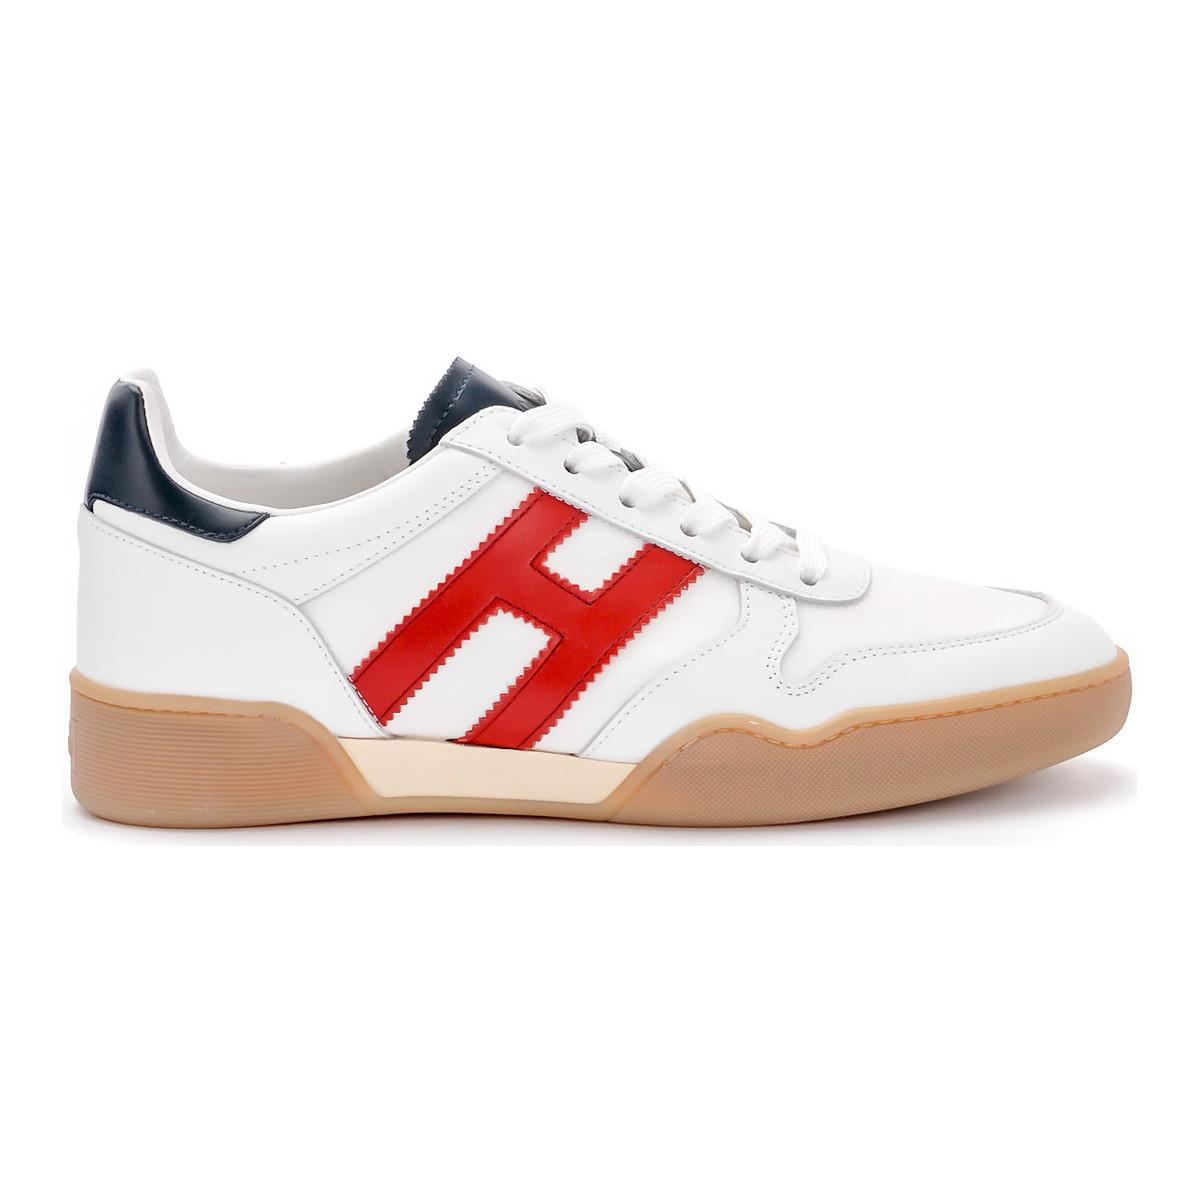 Hogan Sneaker H357 In Pelle E Tessuto Bianco E Rosso Men s Shoes ... 9ce6fb6817c